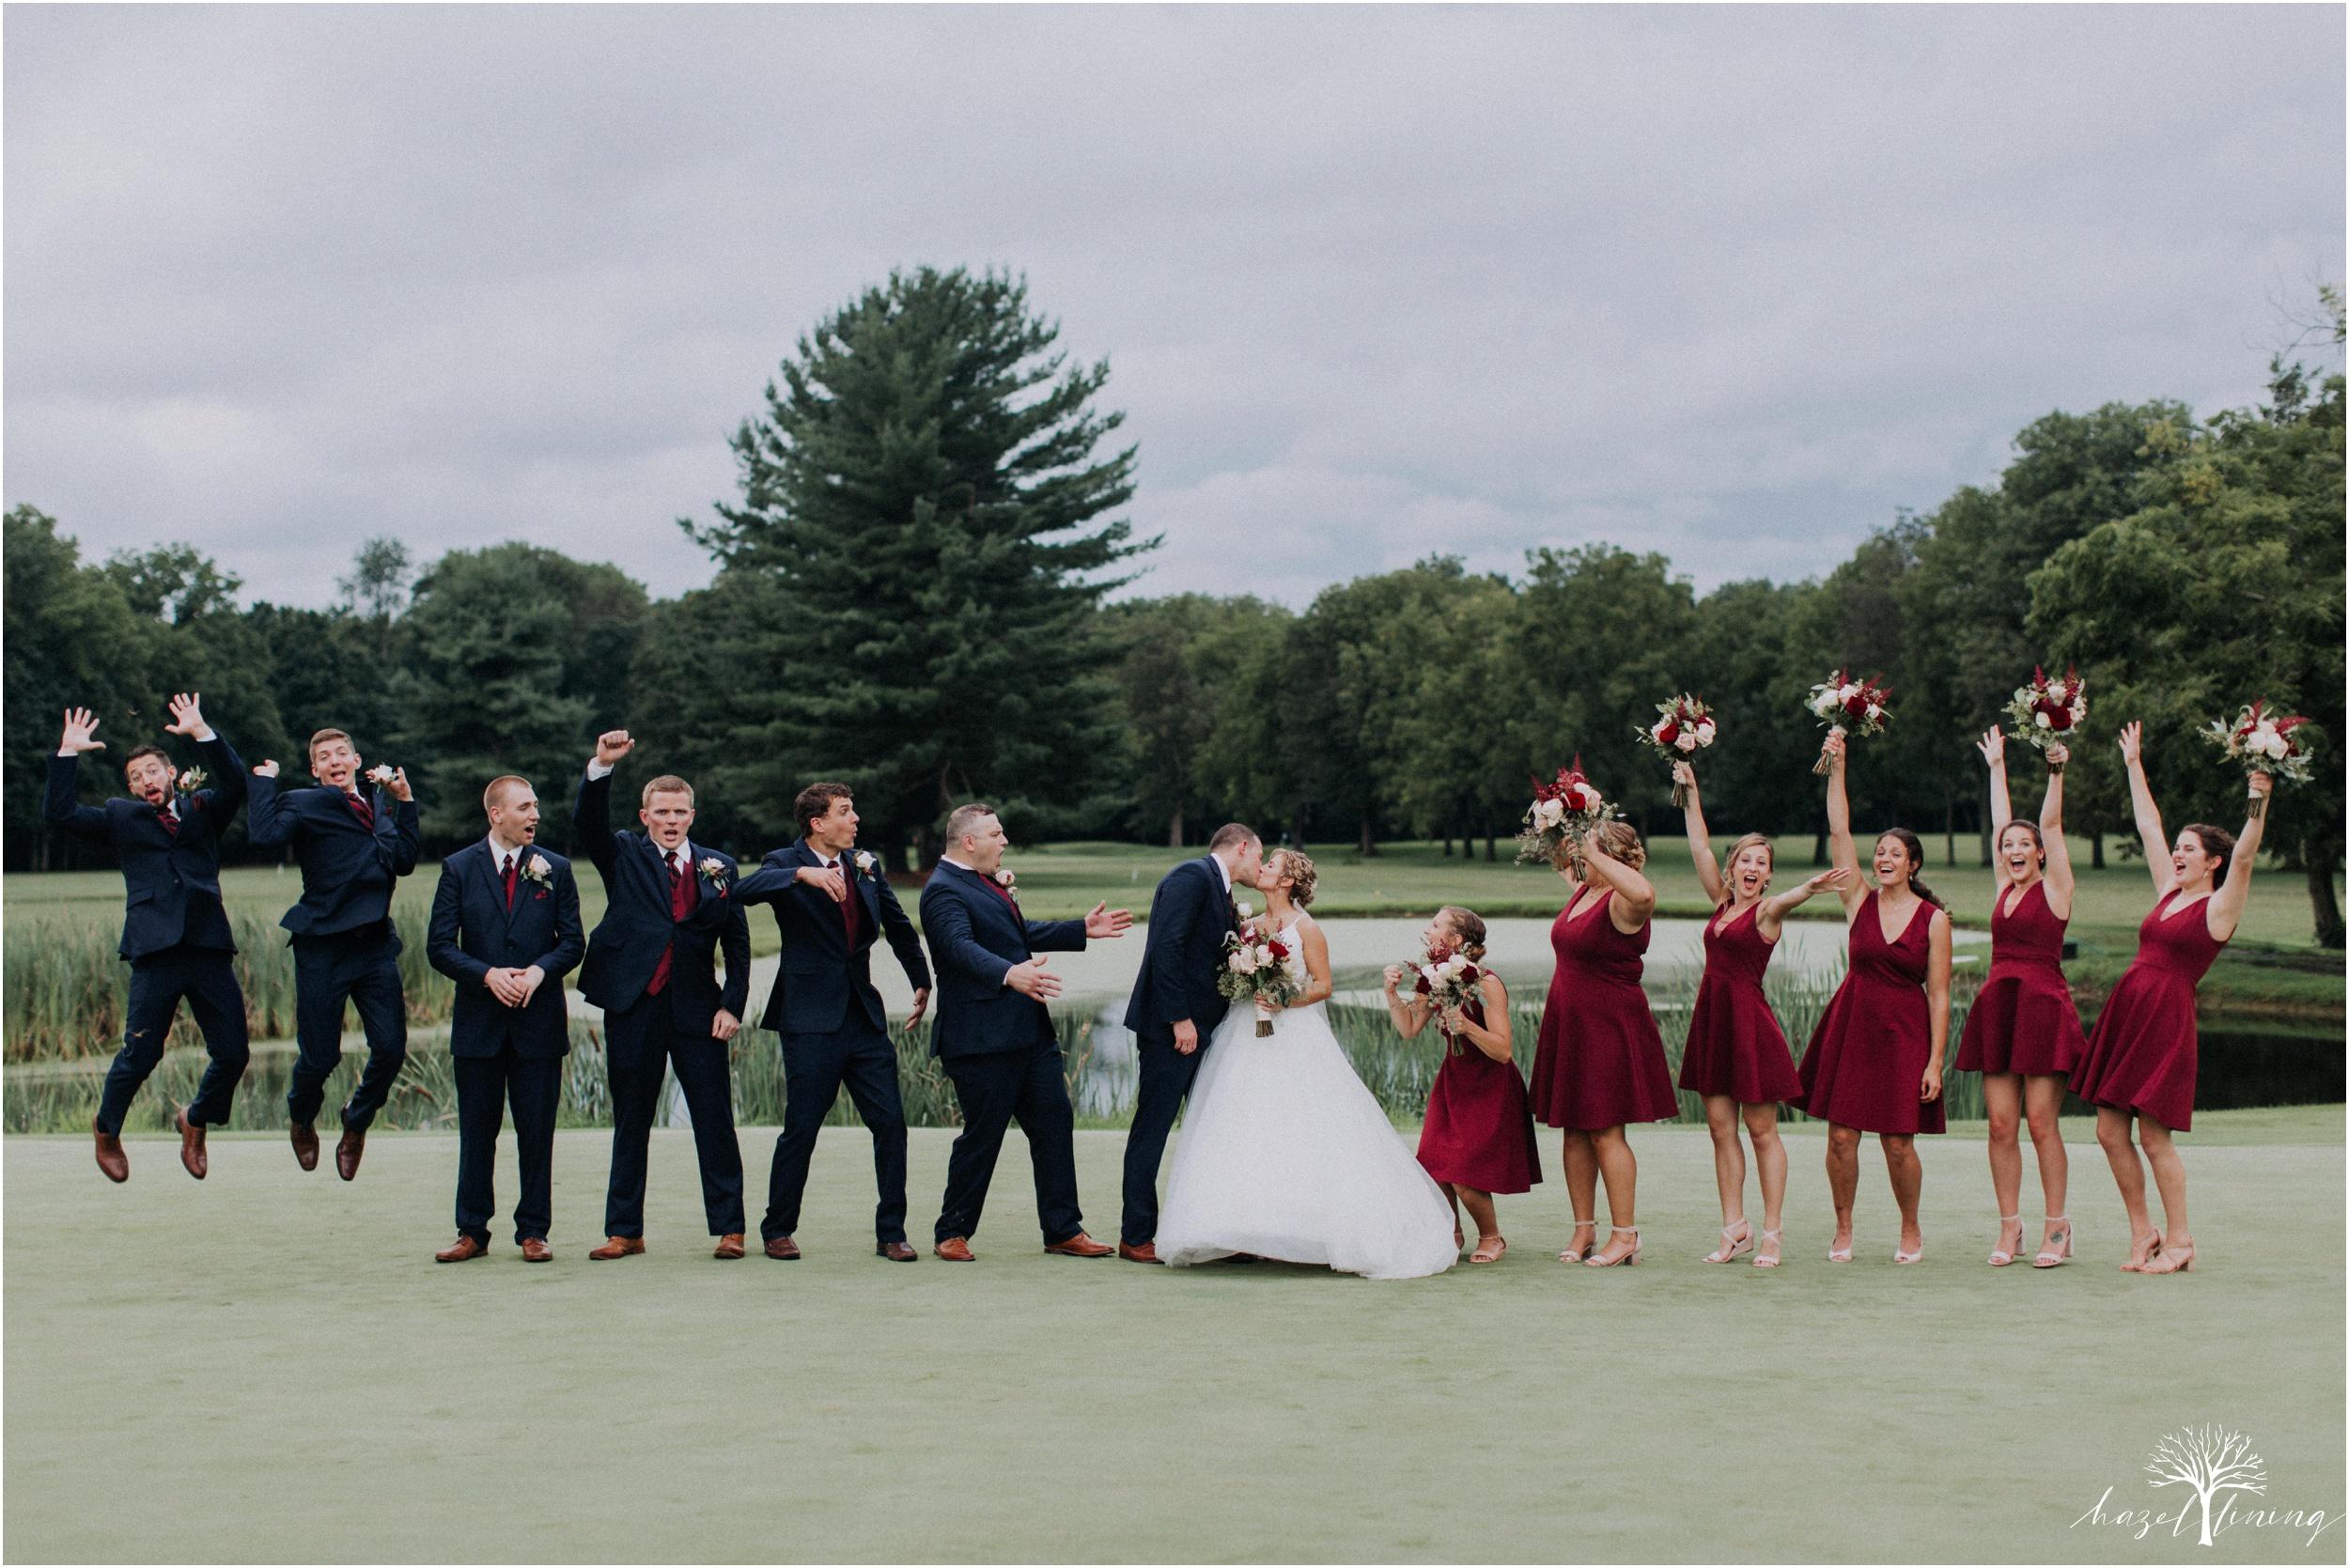 jonathan-weibel-becky-haywood-loft-at-sweetwater-cc-pennsburg-pennsylvania-rainy-day-summer-wedding-hazel-lining-travel-wedding-elopement-photography_0076.jpg